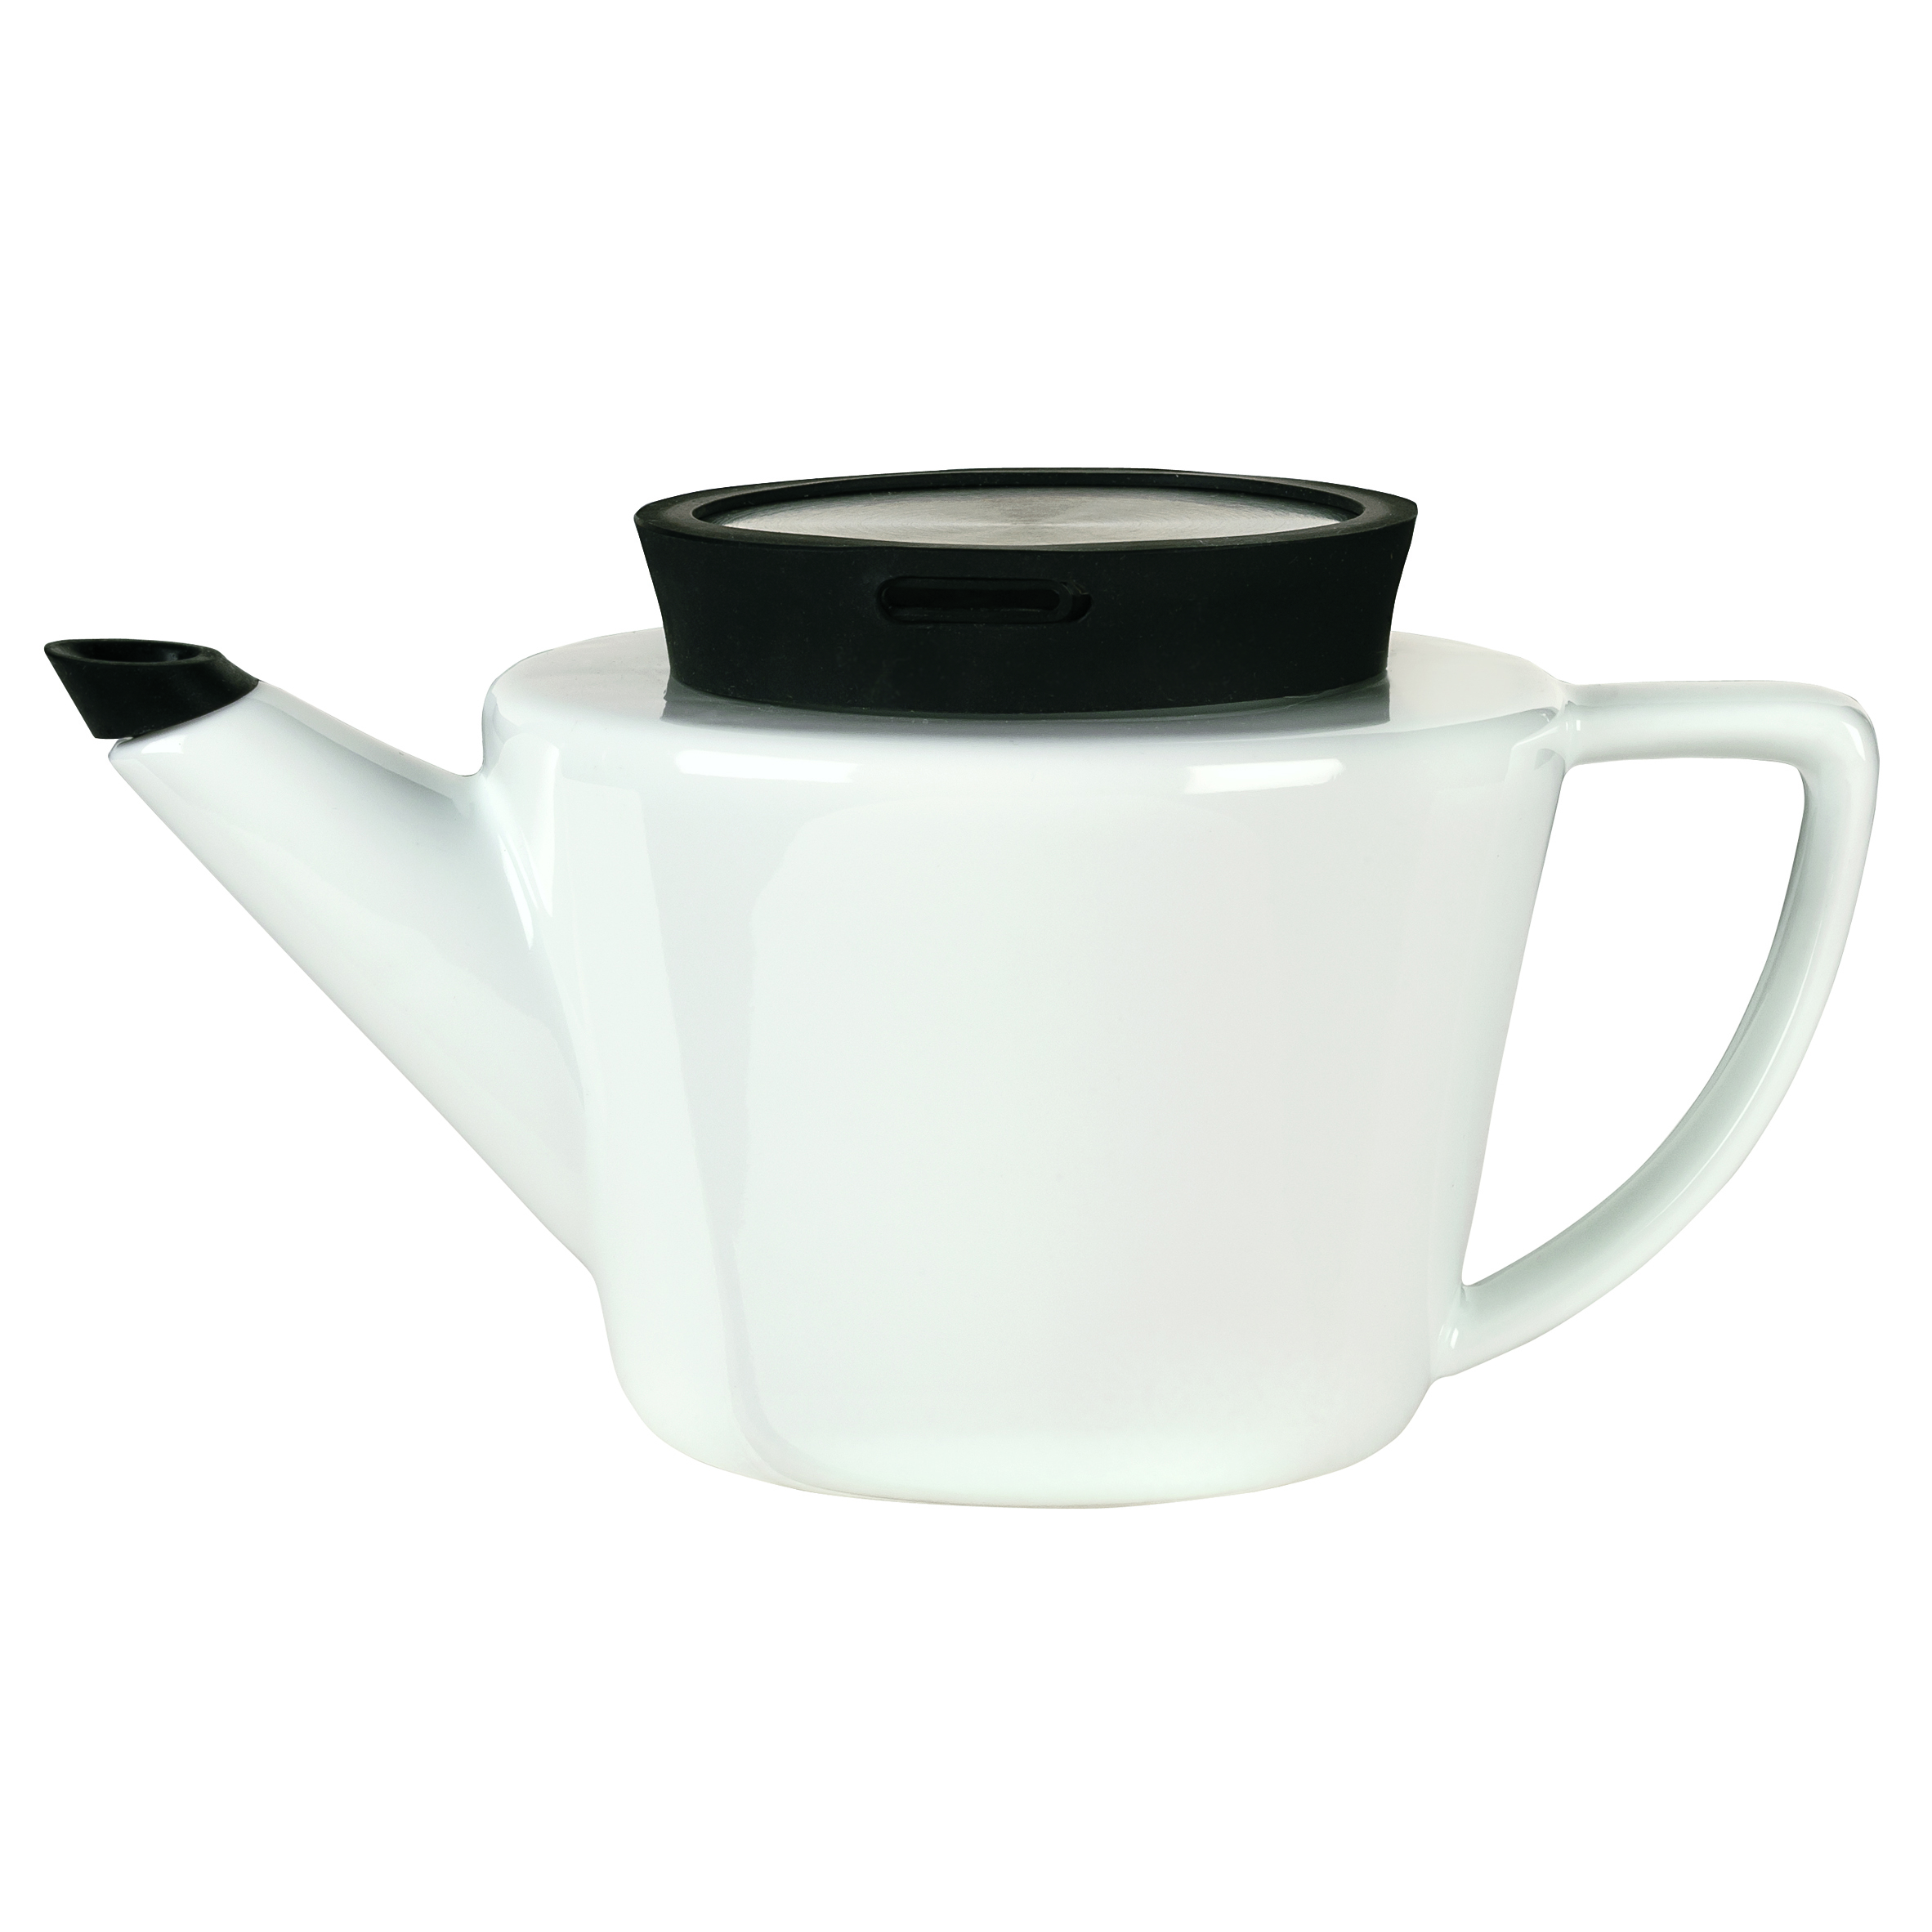 Libbey Glass VS34801 coffee pot/teapot, china